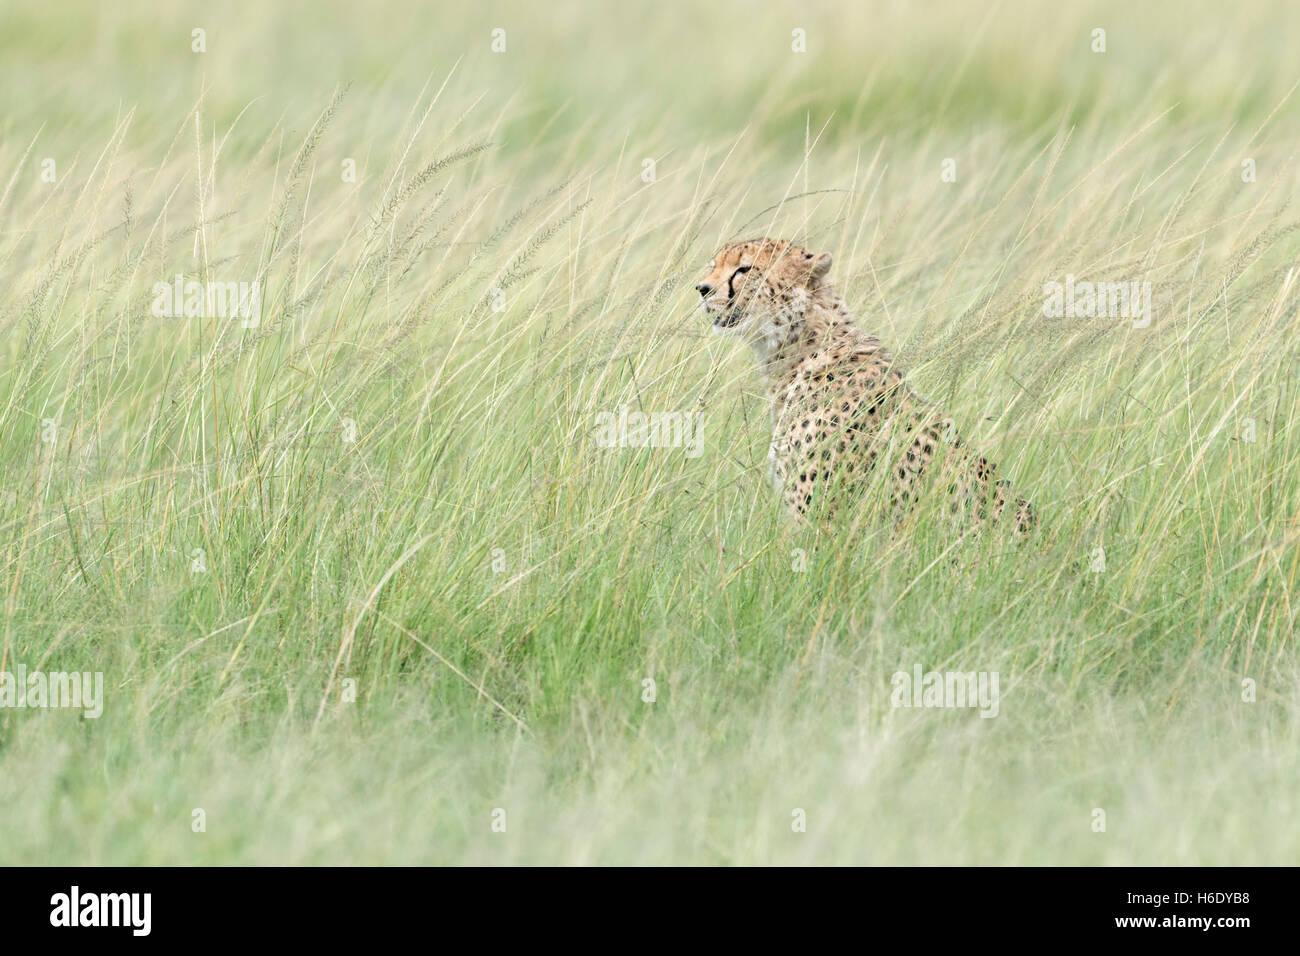 Cheetah (Acinonix jubatus) sitting hiding in grass, looking for prey, Maasai Mara National Reserve, Kenya - Stock Image